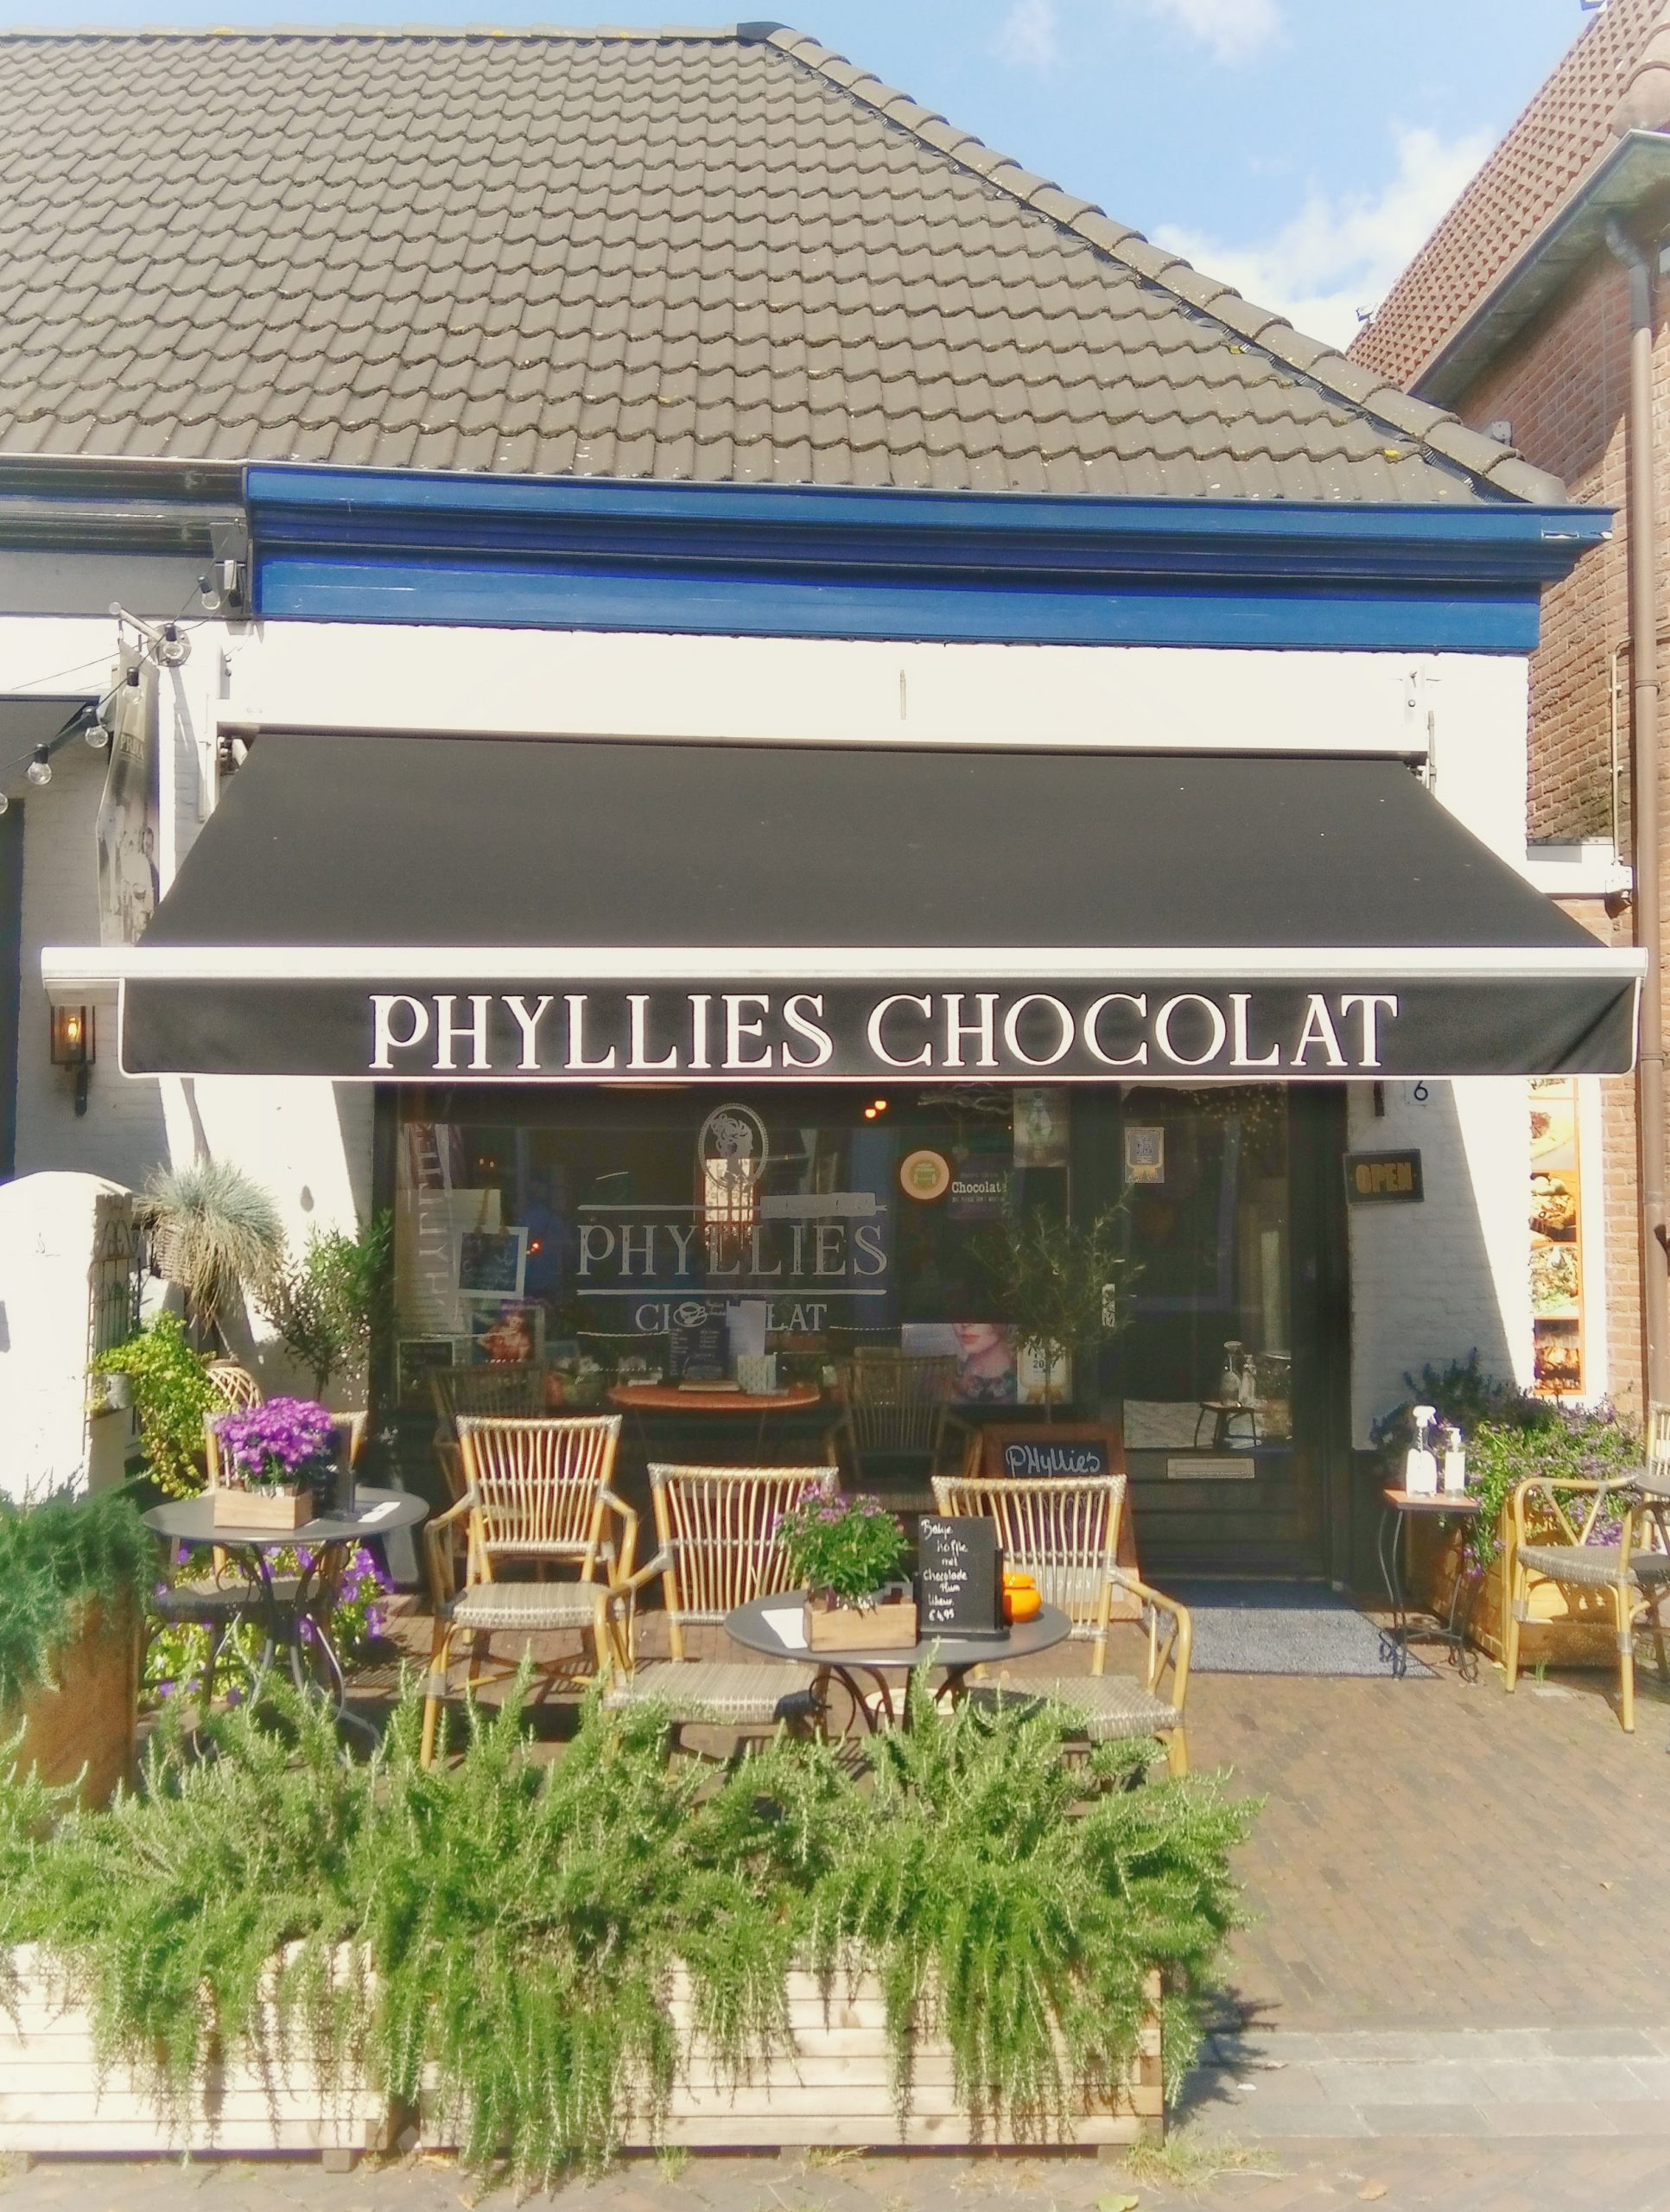 Top chocoshop: Phyllies Chocolat in Nunspeet